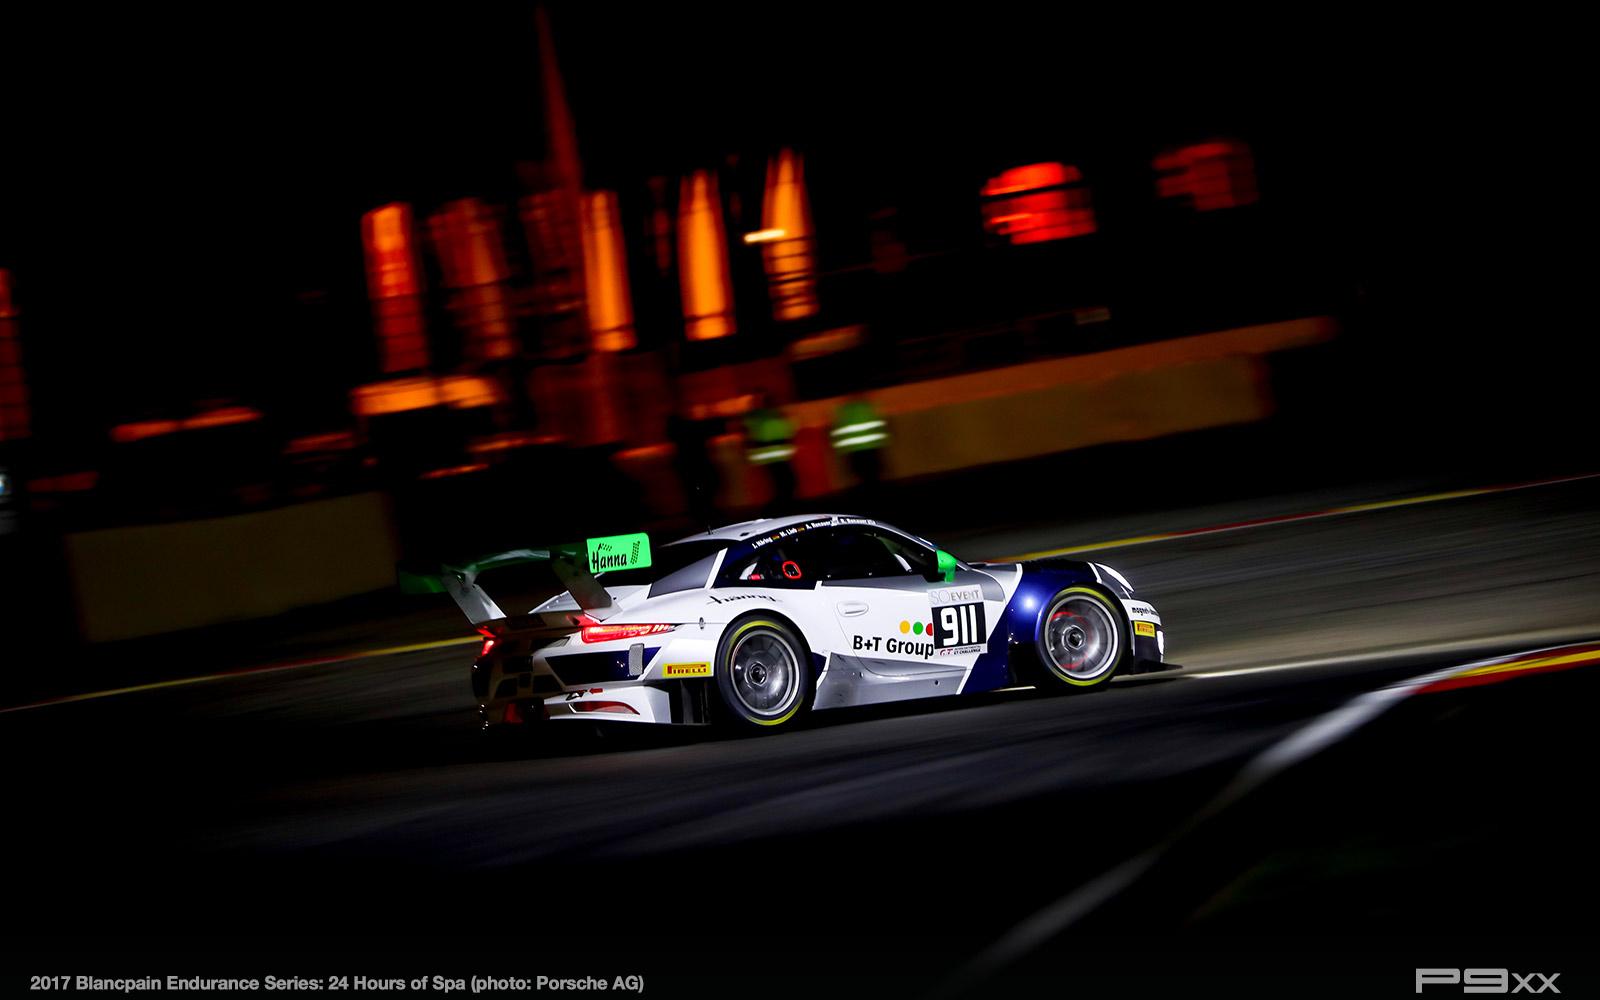 2017-24-Hours-of-Spa-Porsche-325